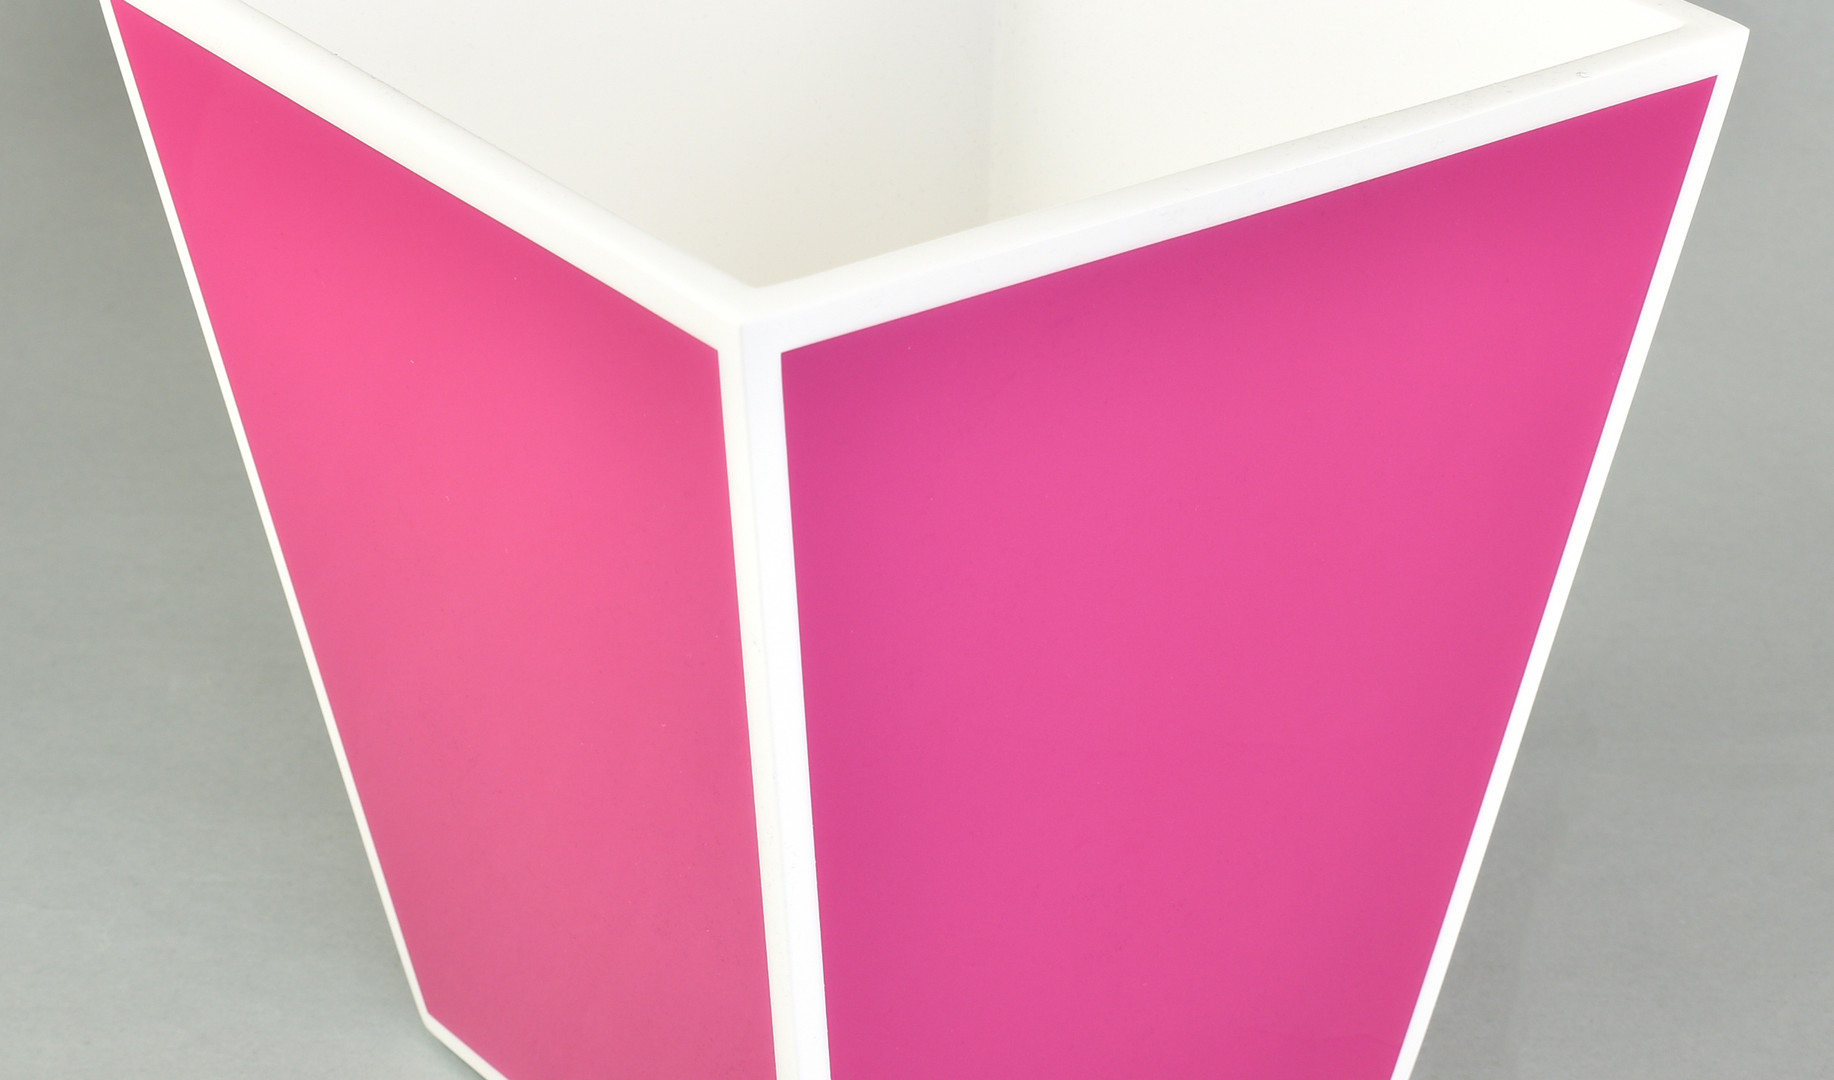 Hot Pink with White- Wastebasket